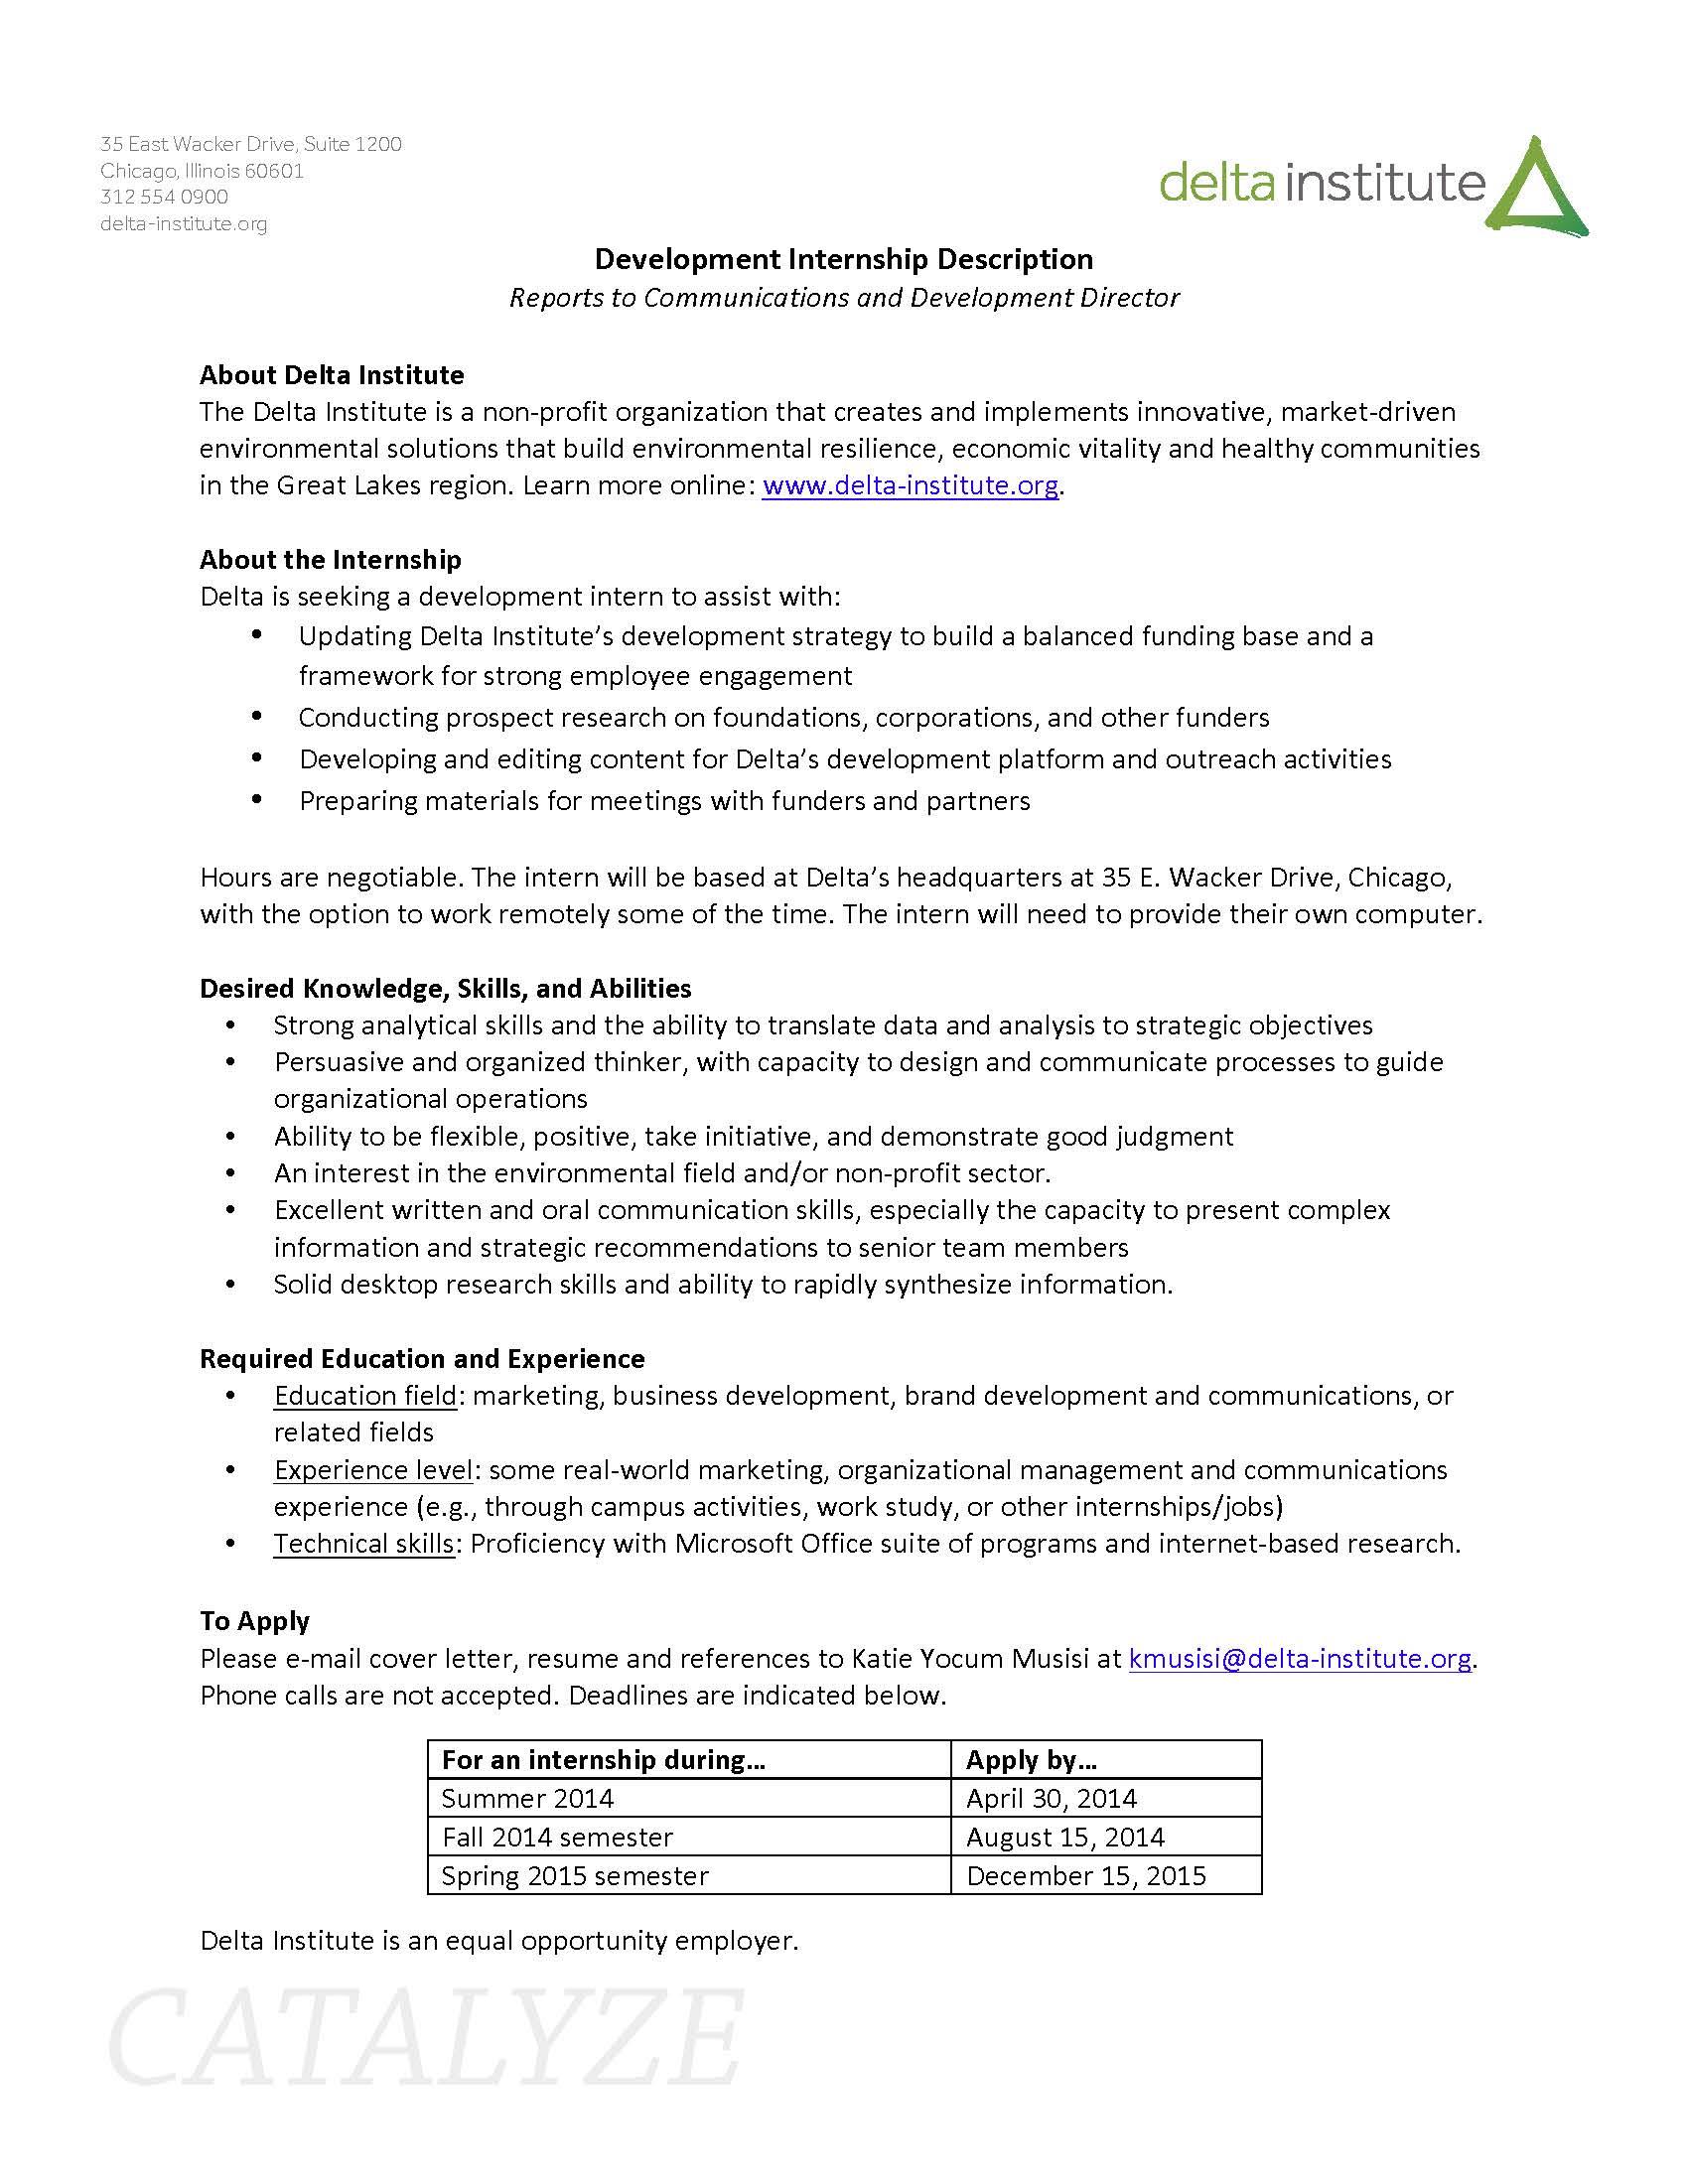 delta inst development_internship_description_april 2014